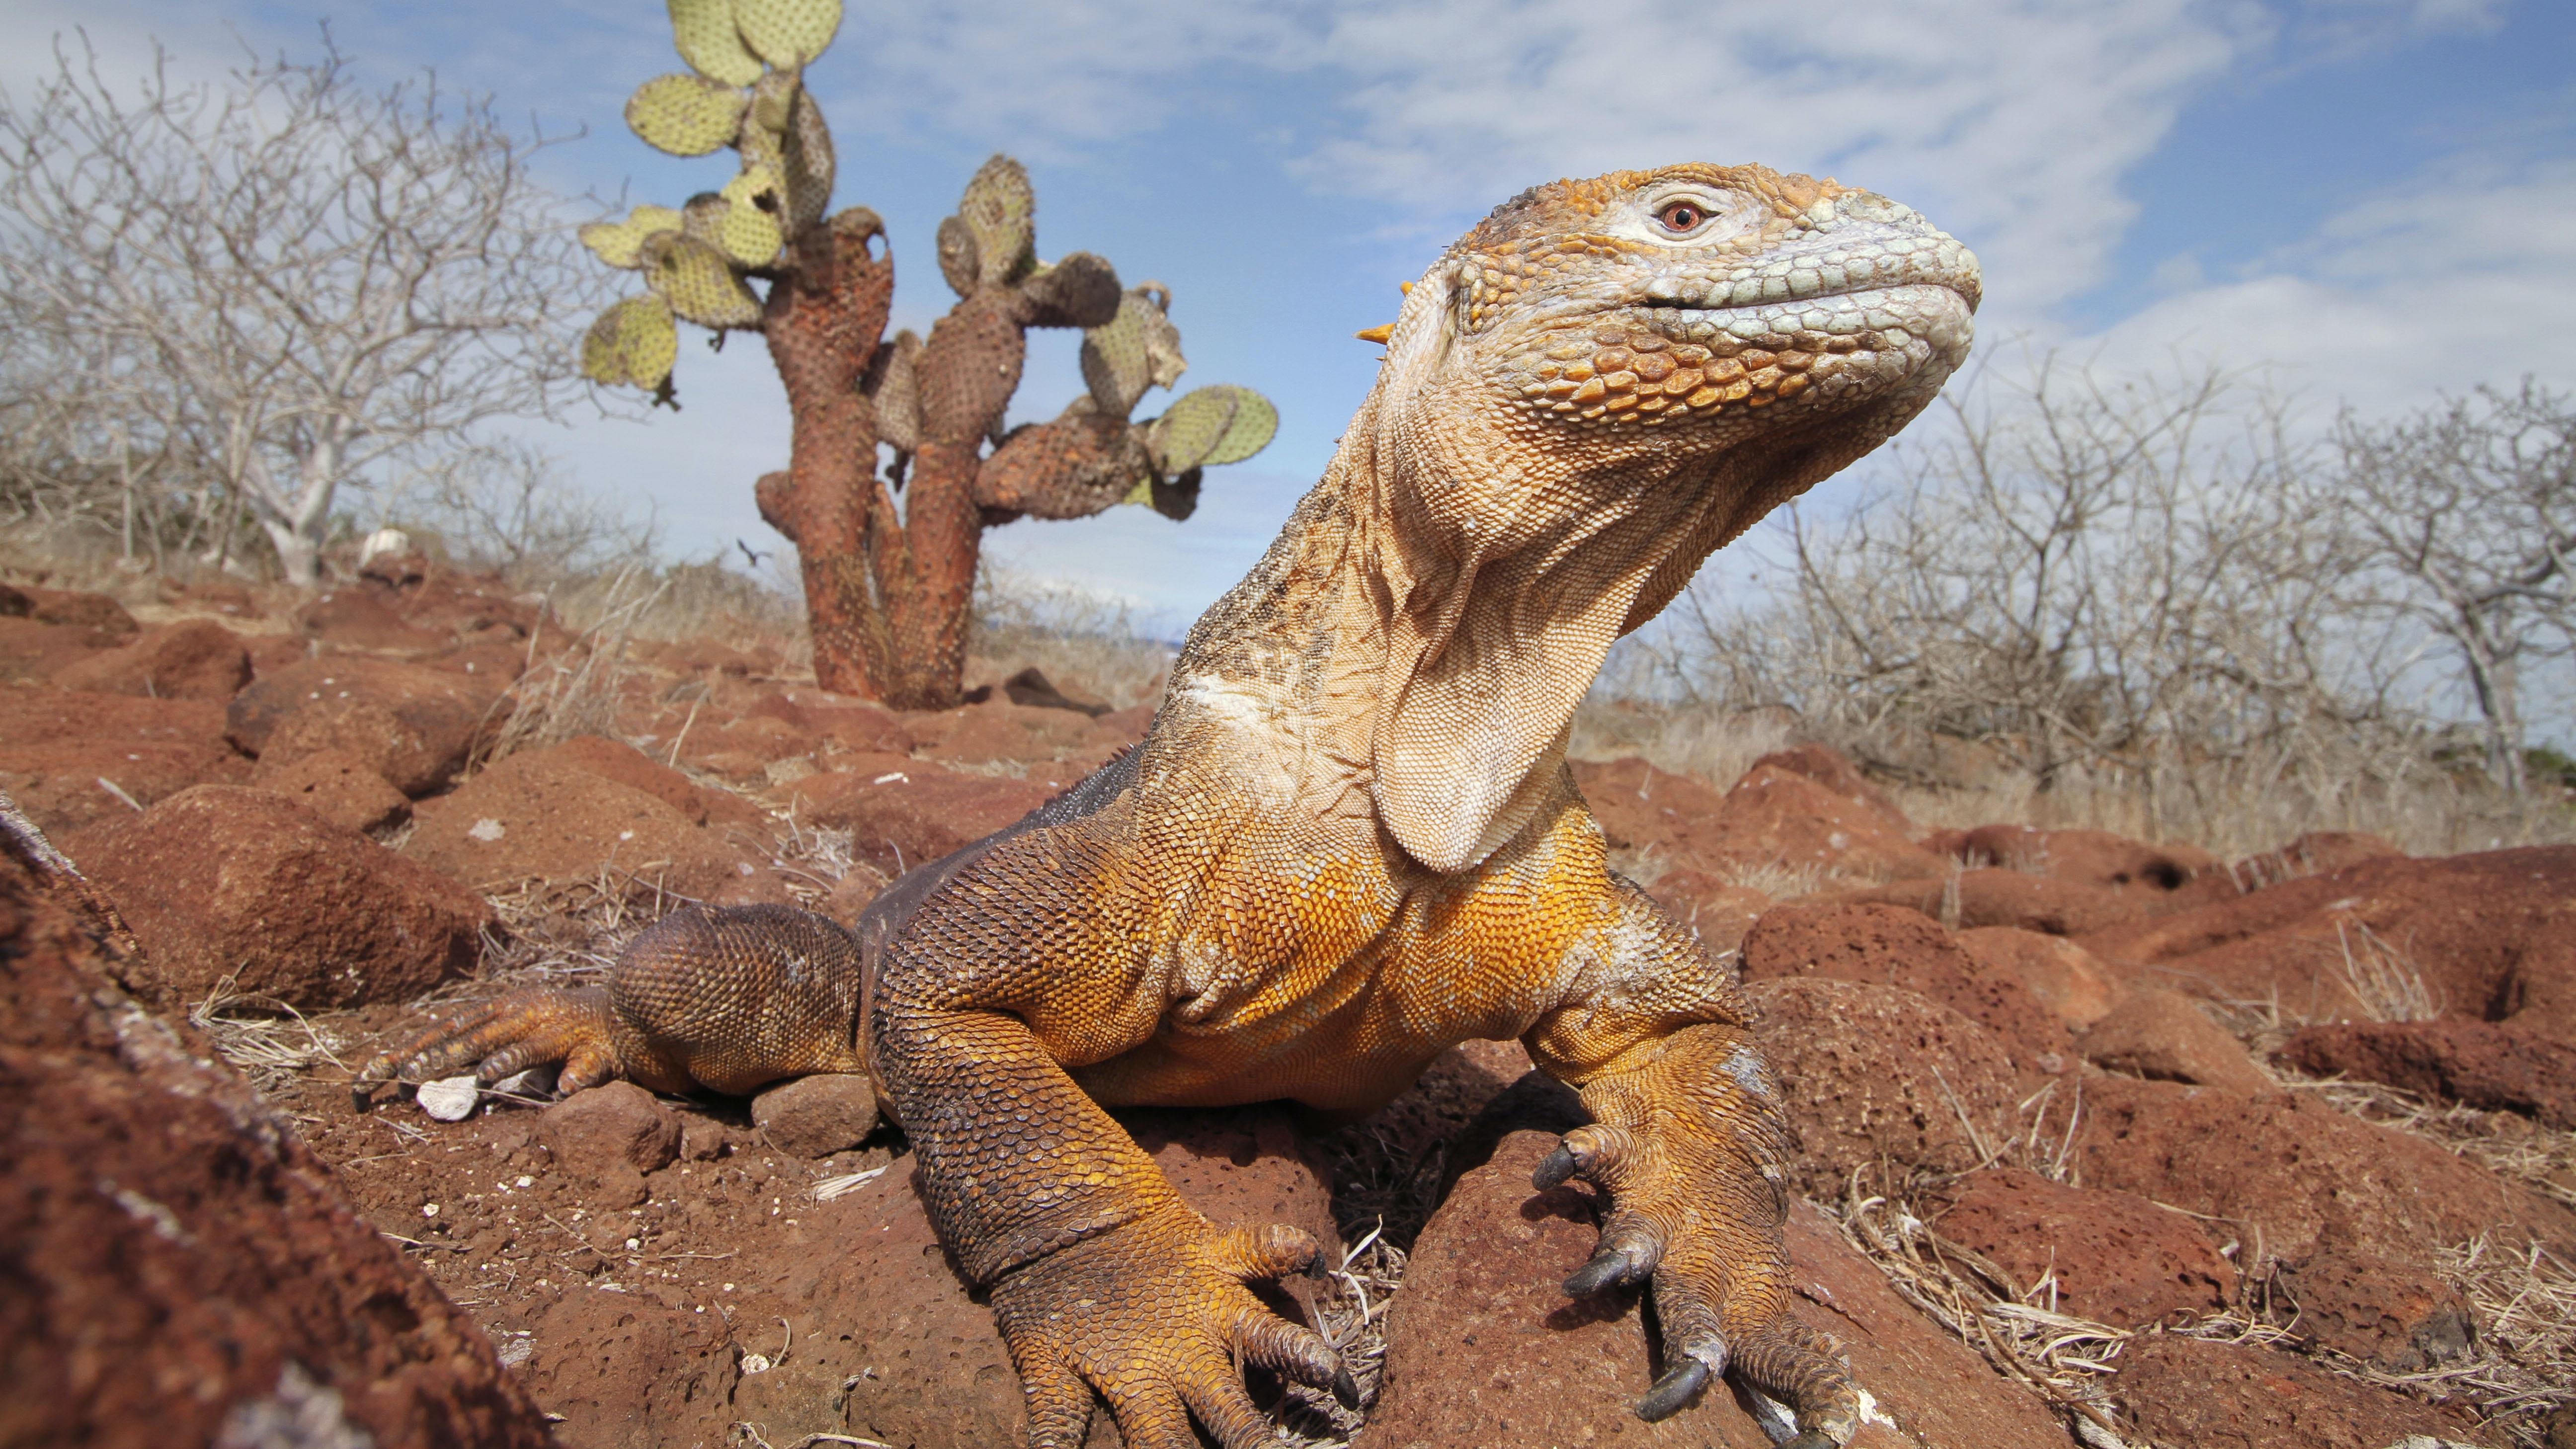 brown komodo dragon on pile of dirt